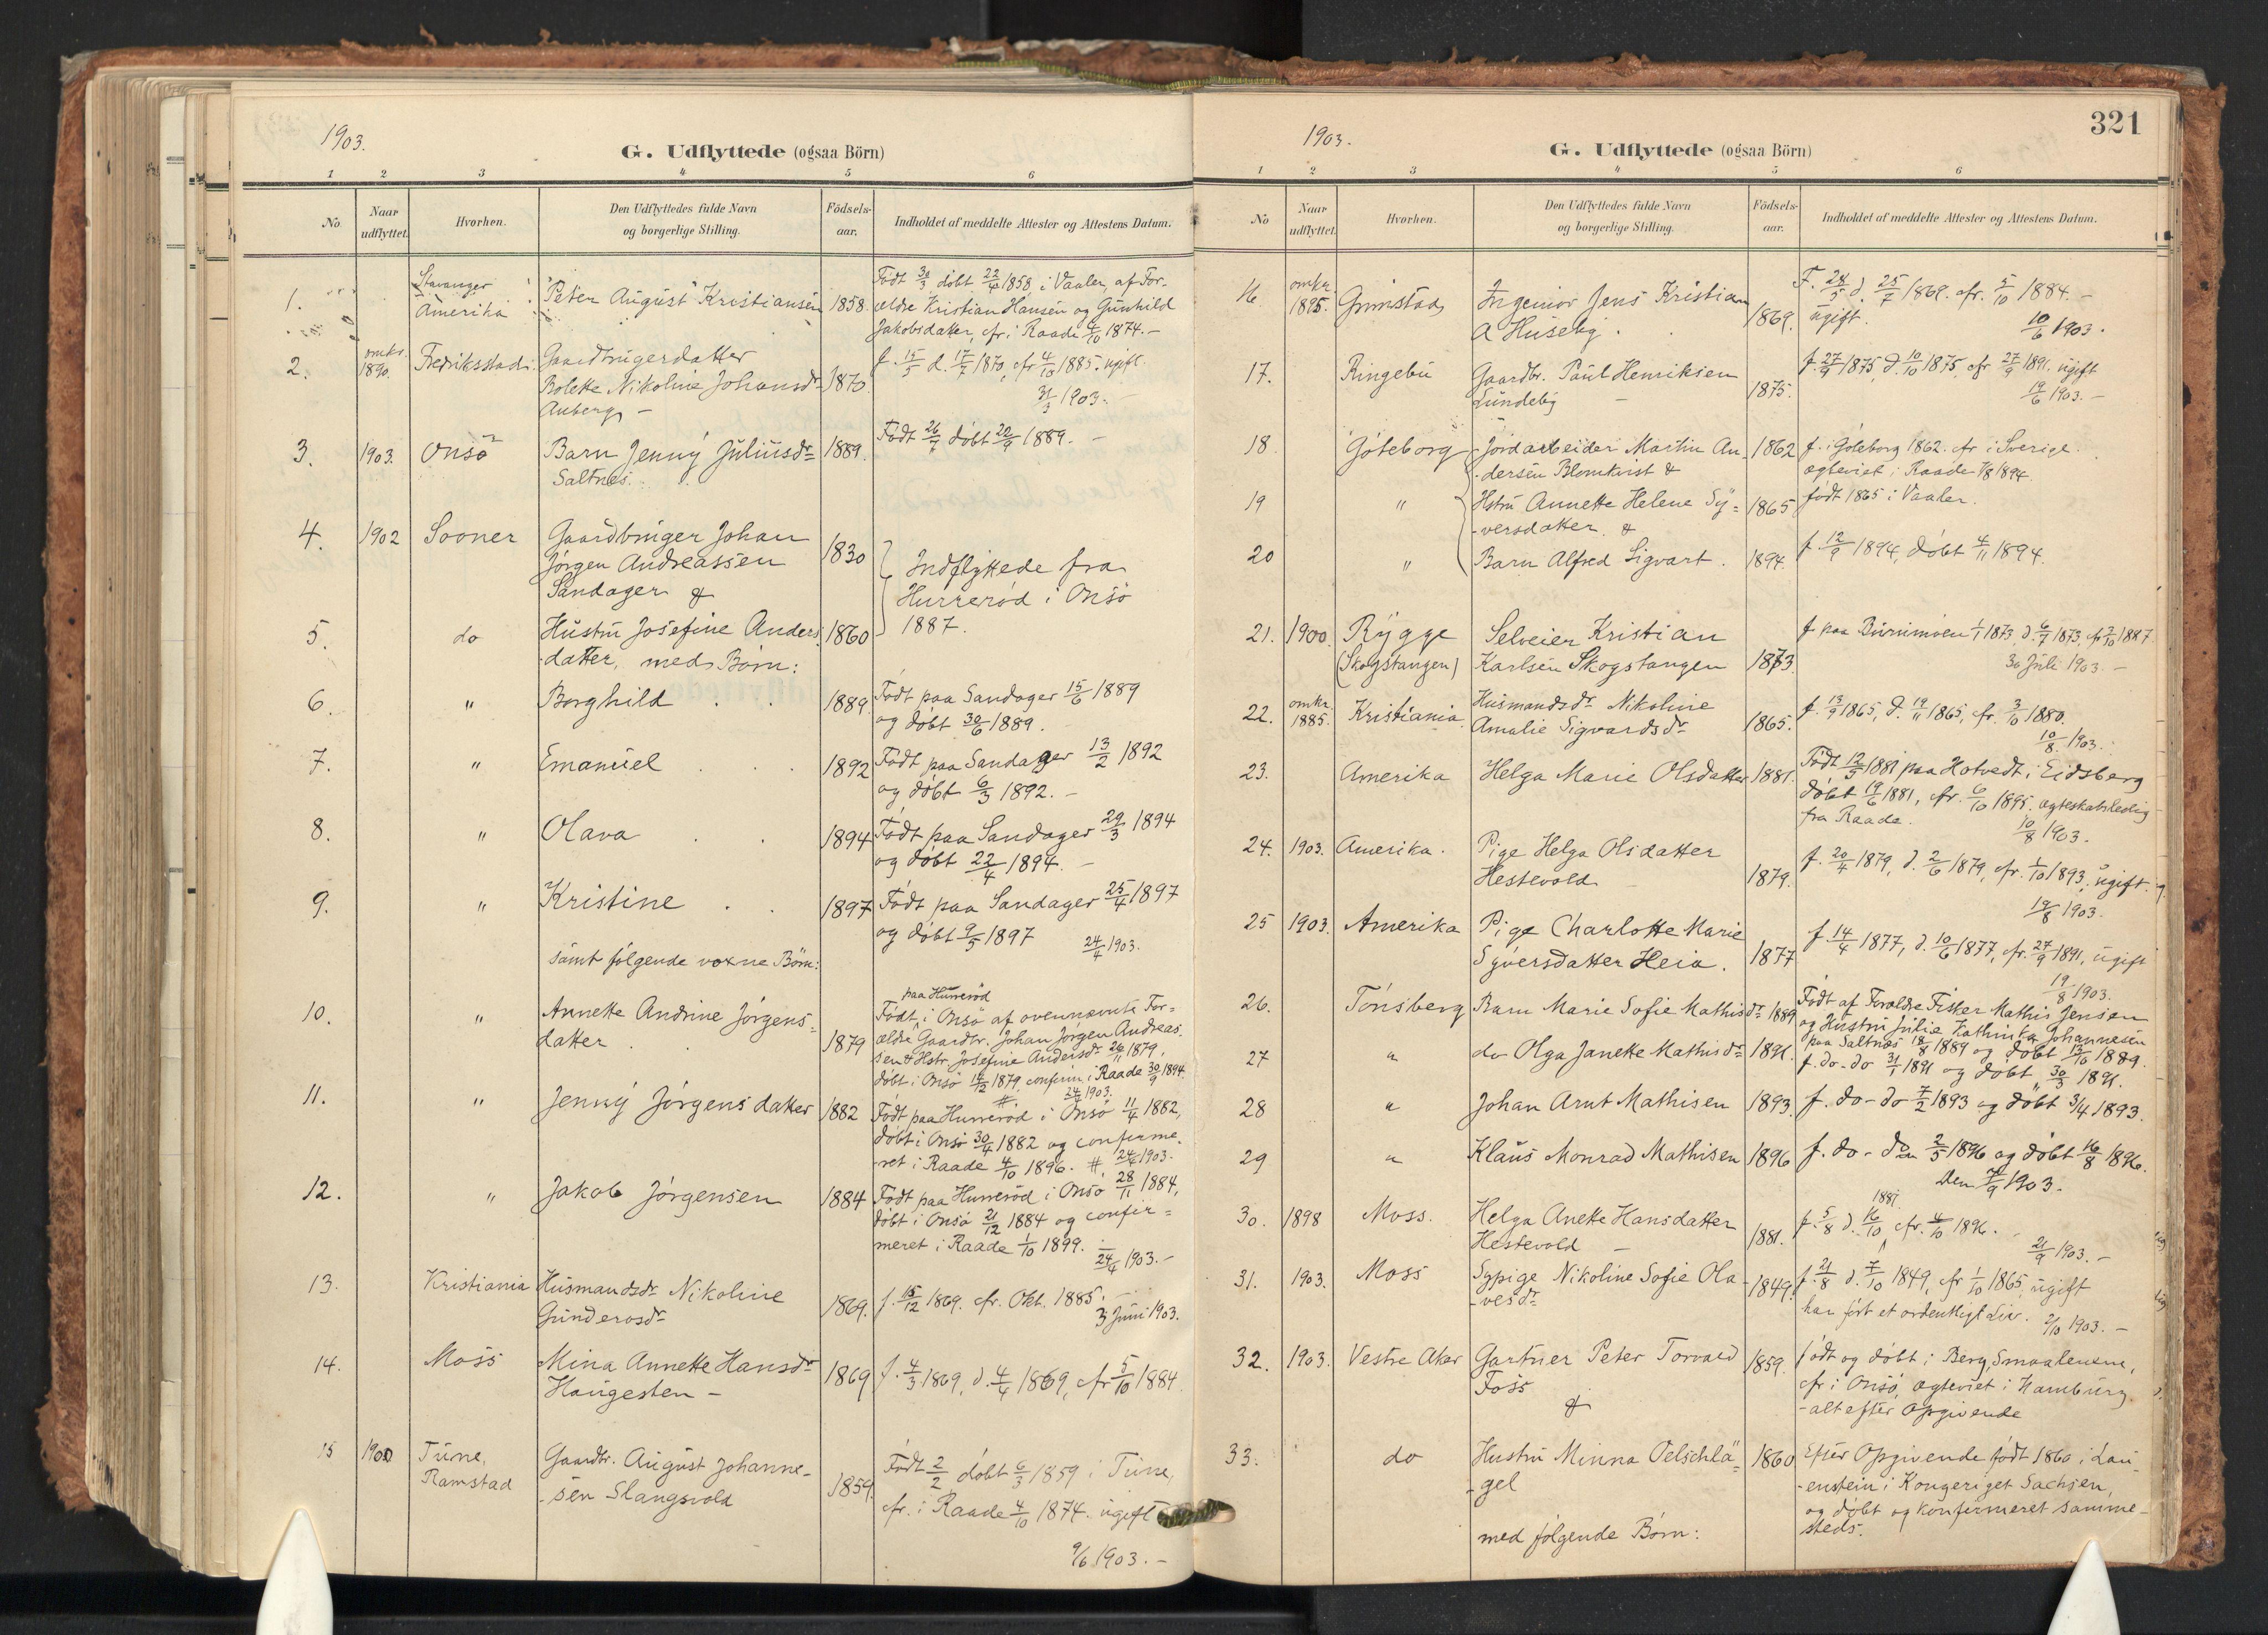 SAO, Råde prestekontor kirkebøker, F/Fa/L0008: Ministerialbok nr. 8, 1903-1924, s. 321